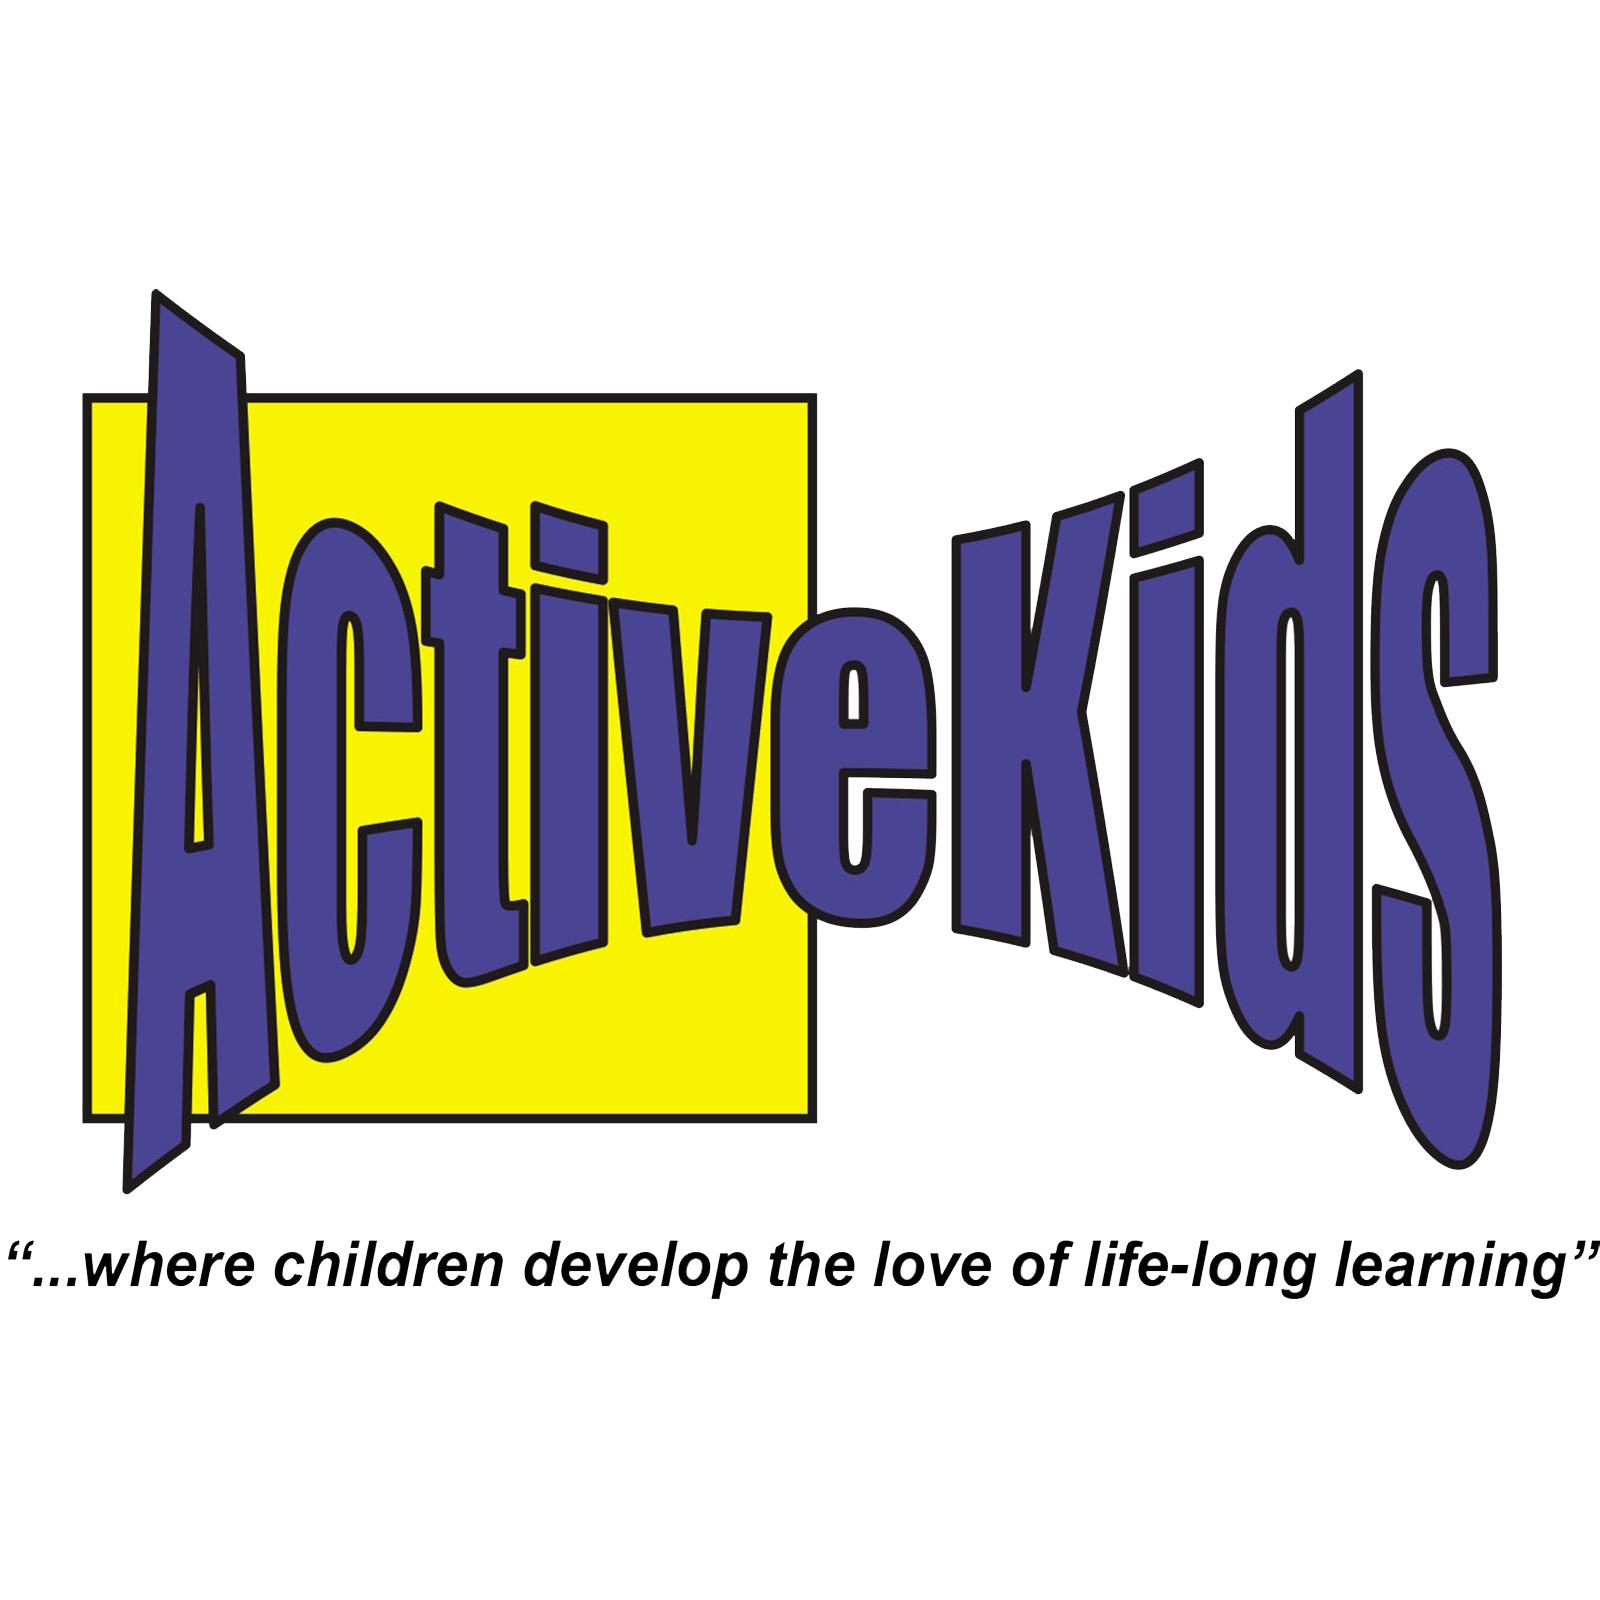 資深ActiveKids外籍老師